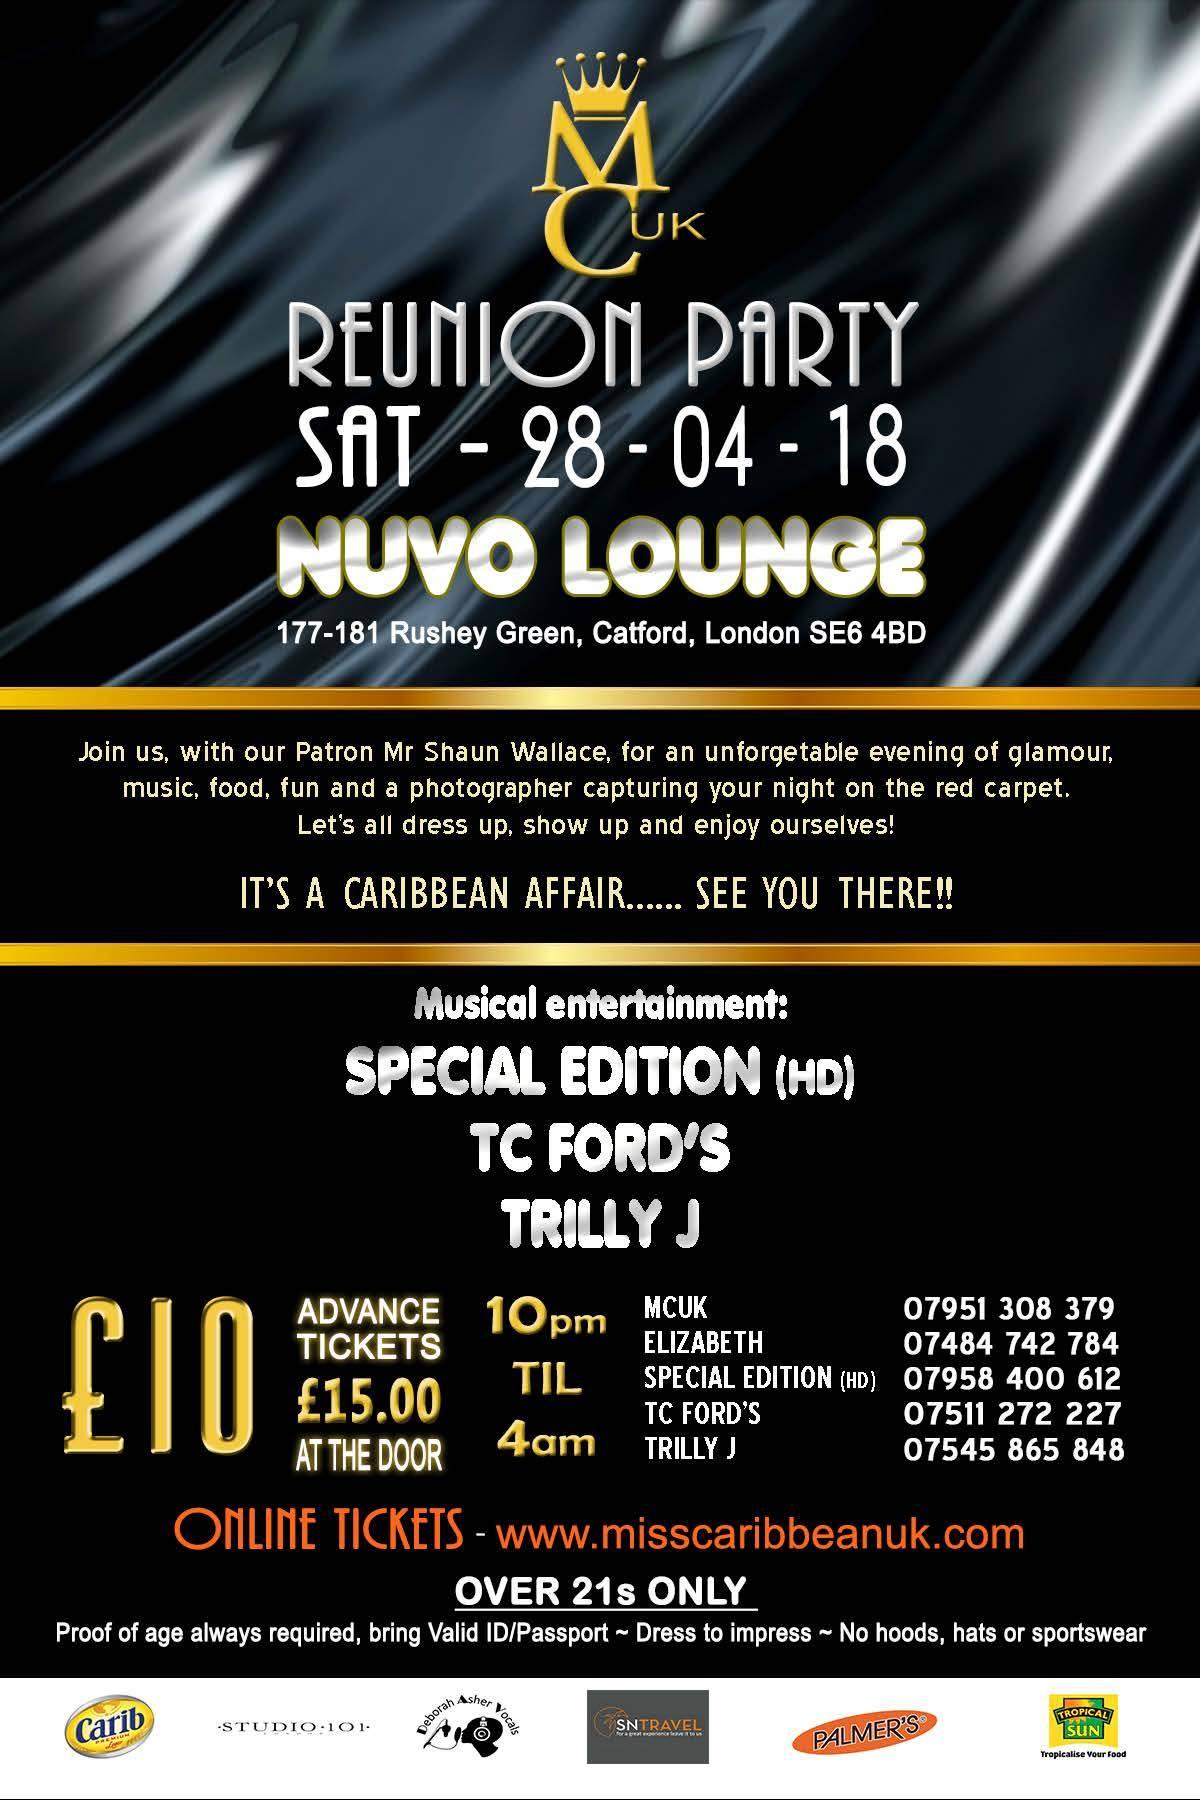 Miss Caribbean UK Reunion Party